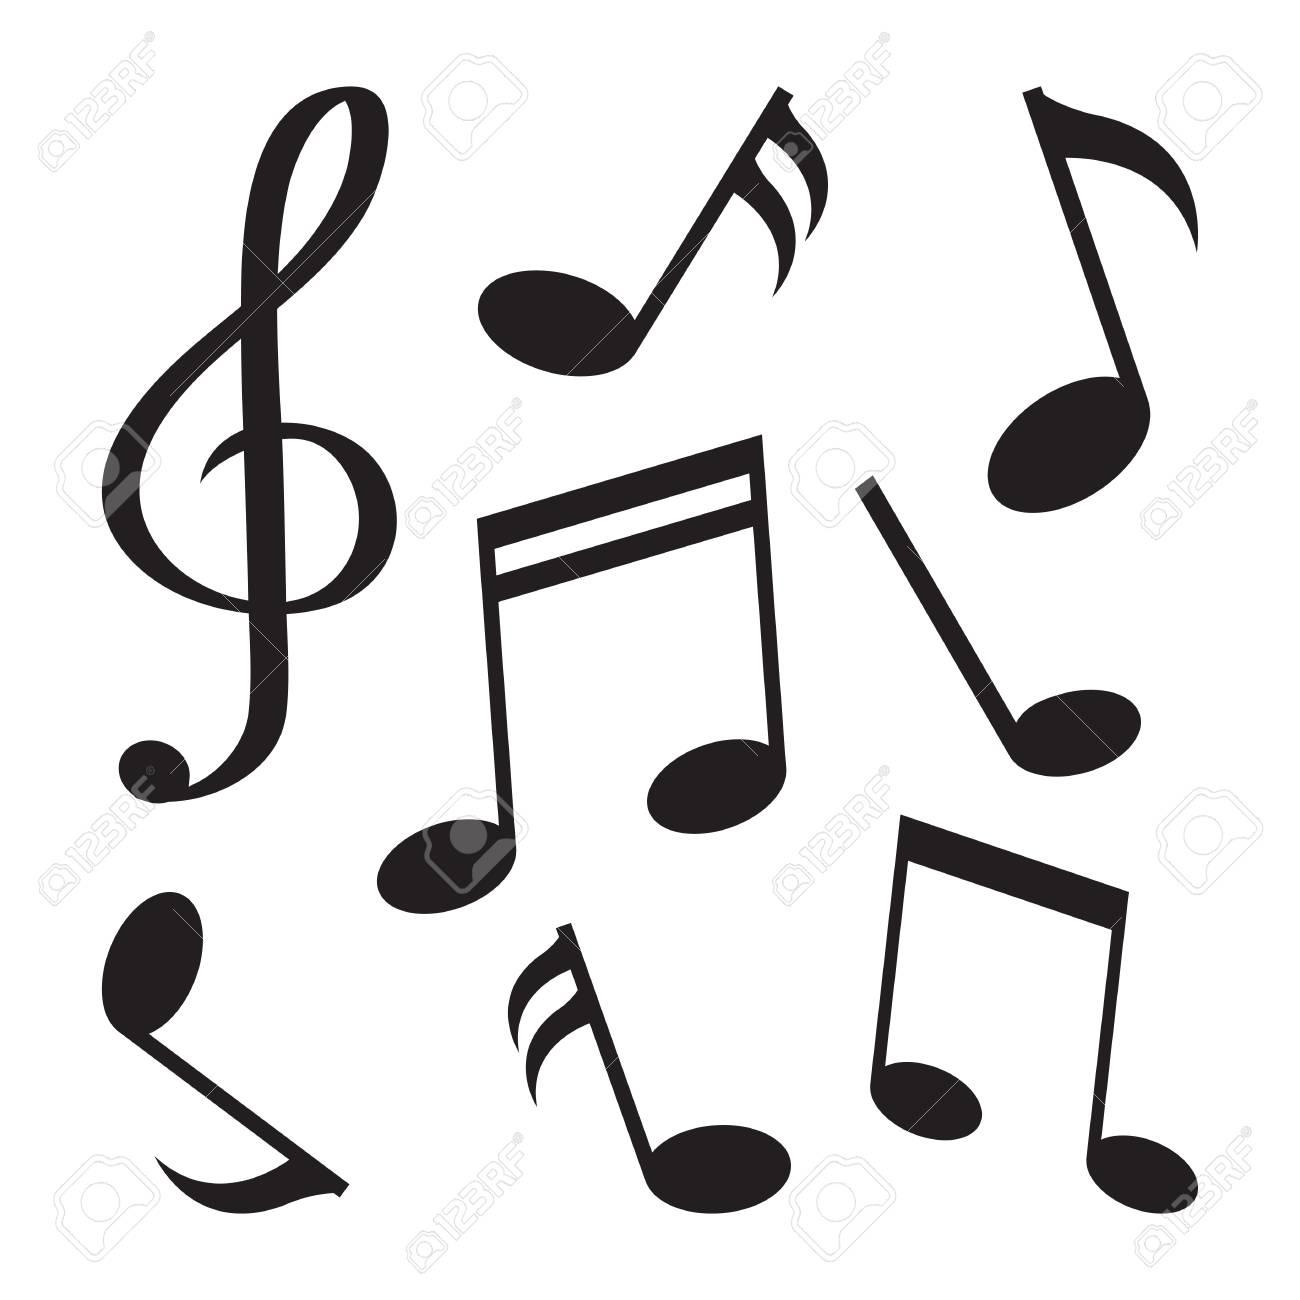 Conjunto De Notas Musicales Silueta Negra Aislado Sobre Fondo